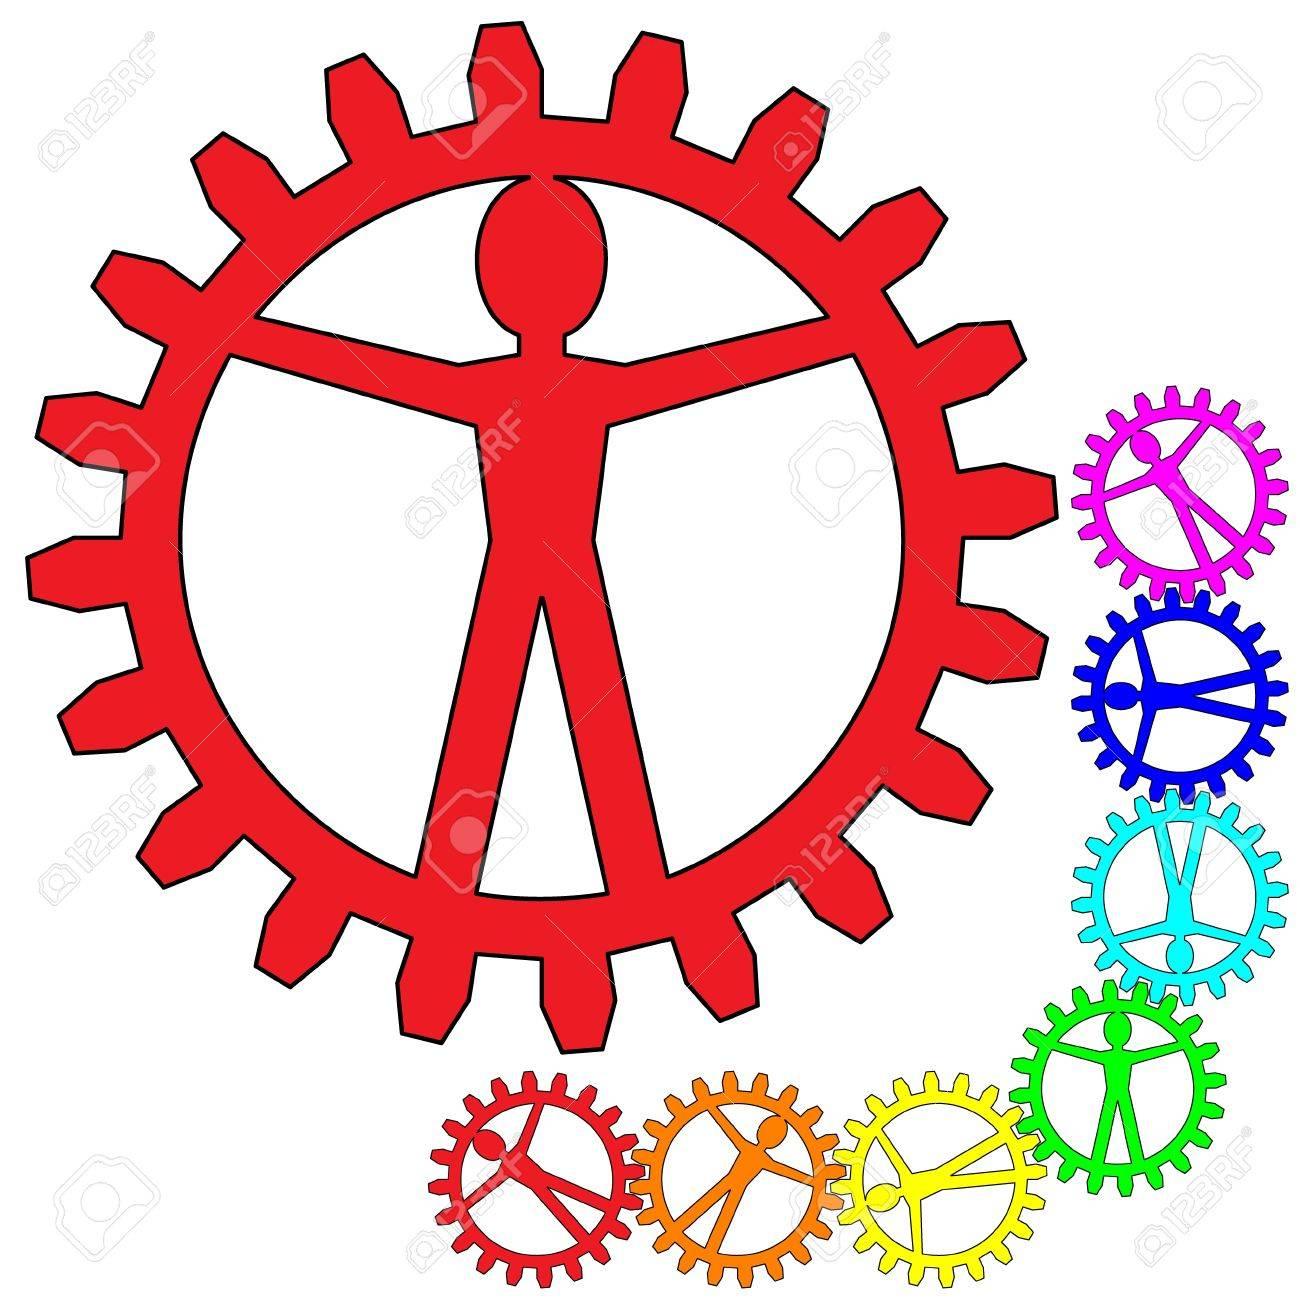 People like gears - company, work, individuality Stock Vector - 13741953